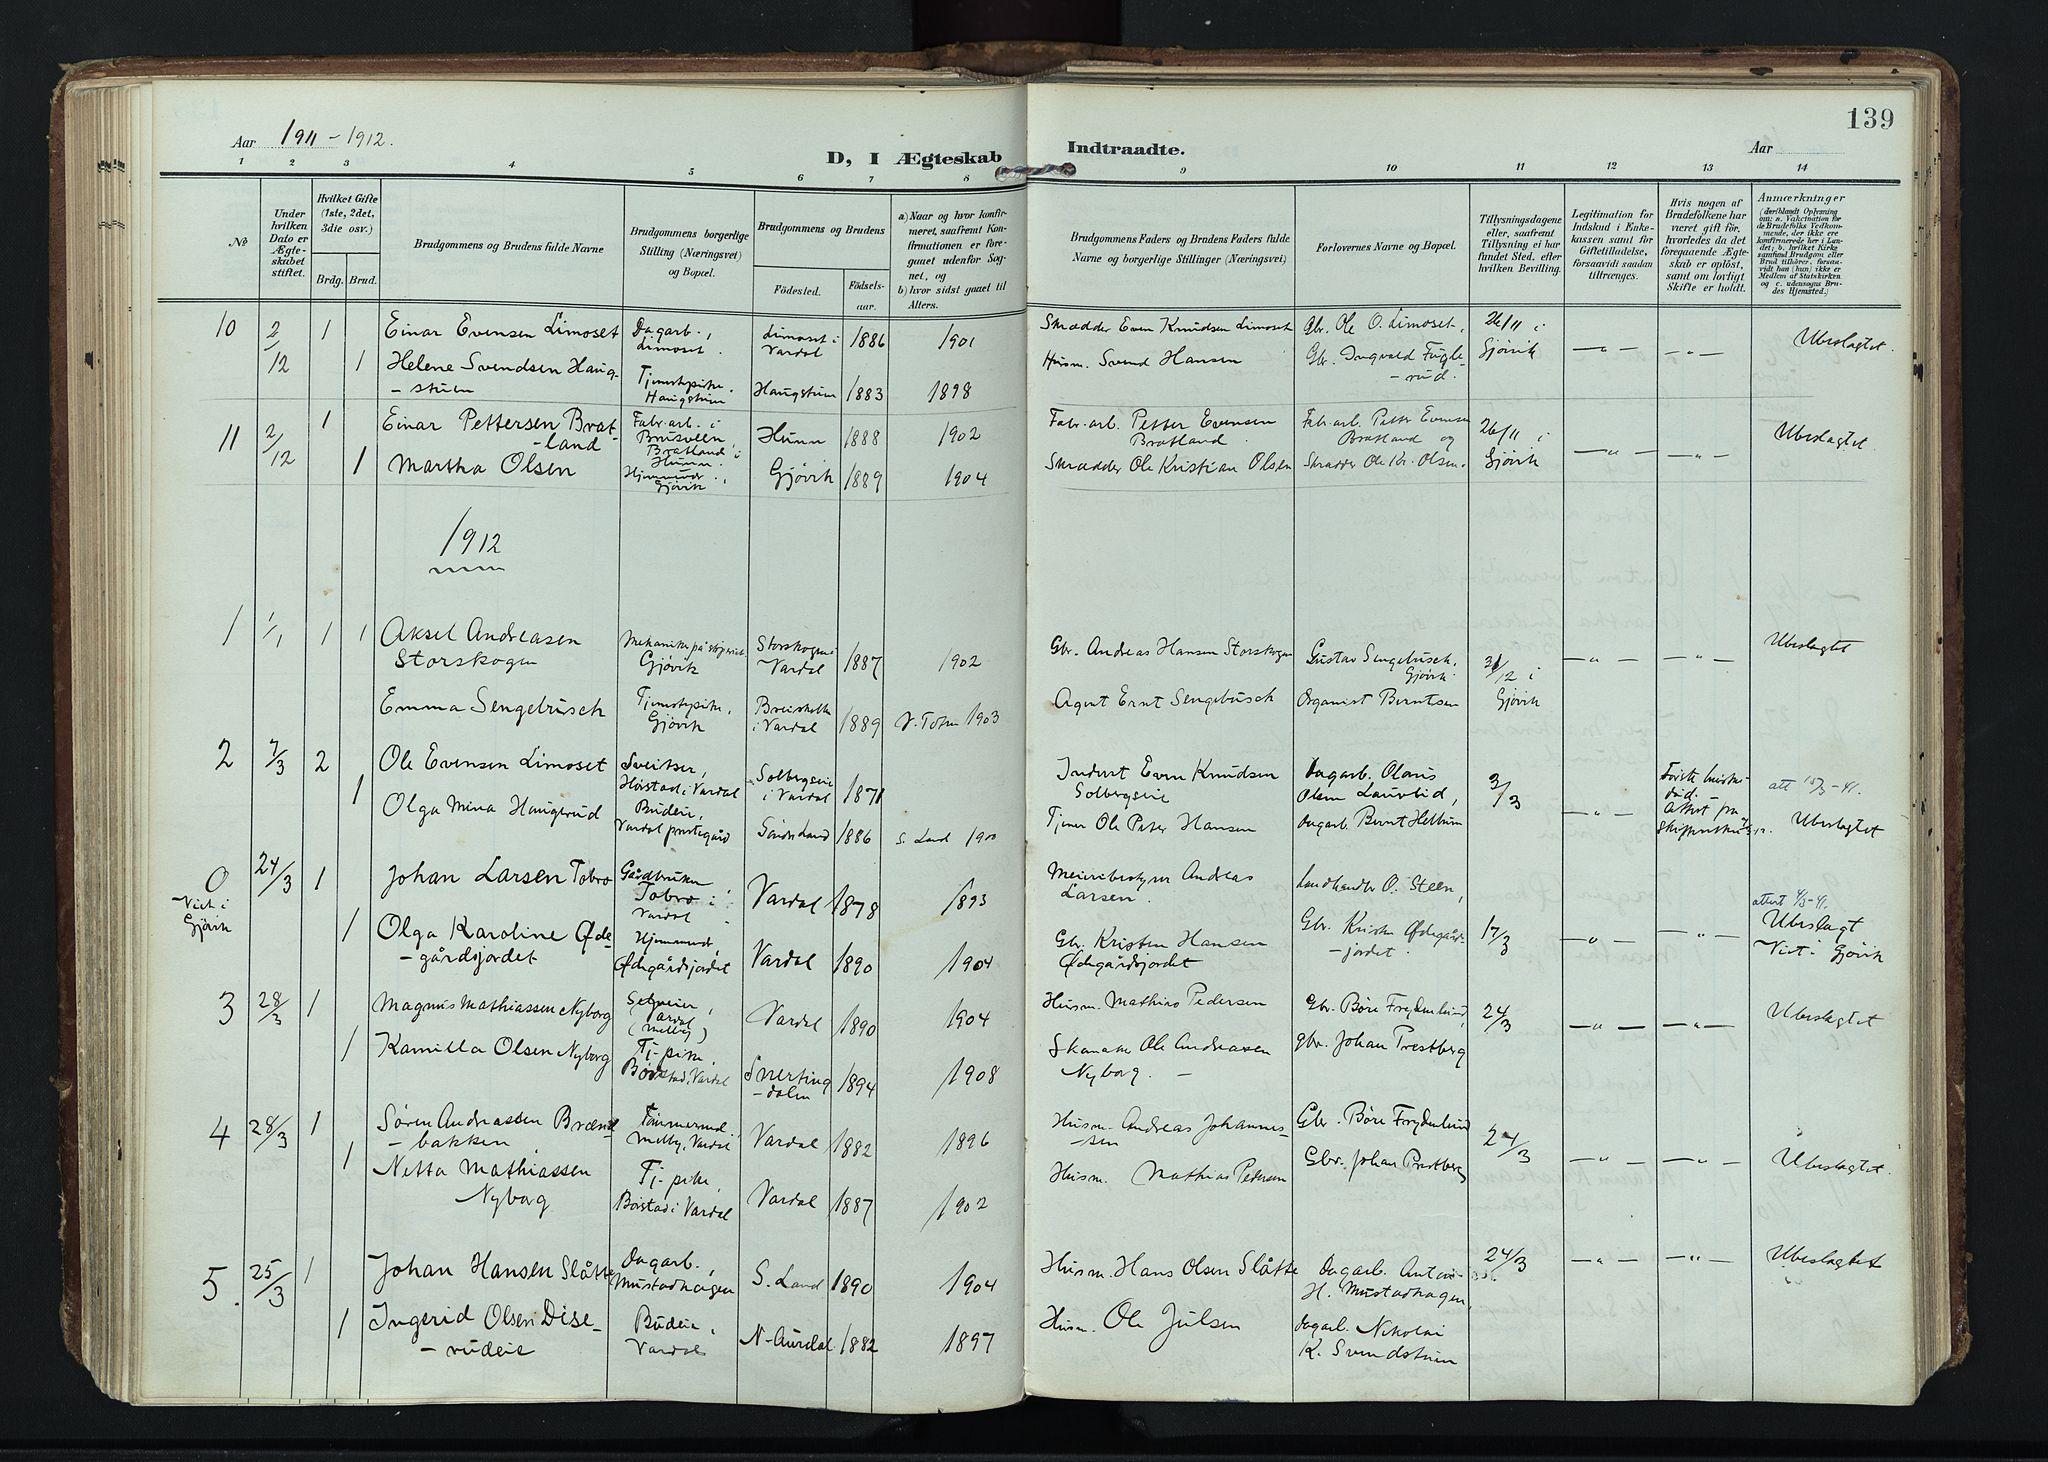 SAH, Vardal prestekontor, H/Ha/Haa/L0020: Ministerialbok nr. 20, 1907-1921, s. 139